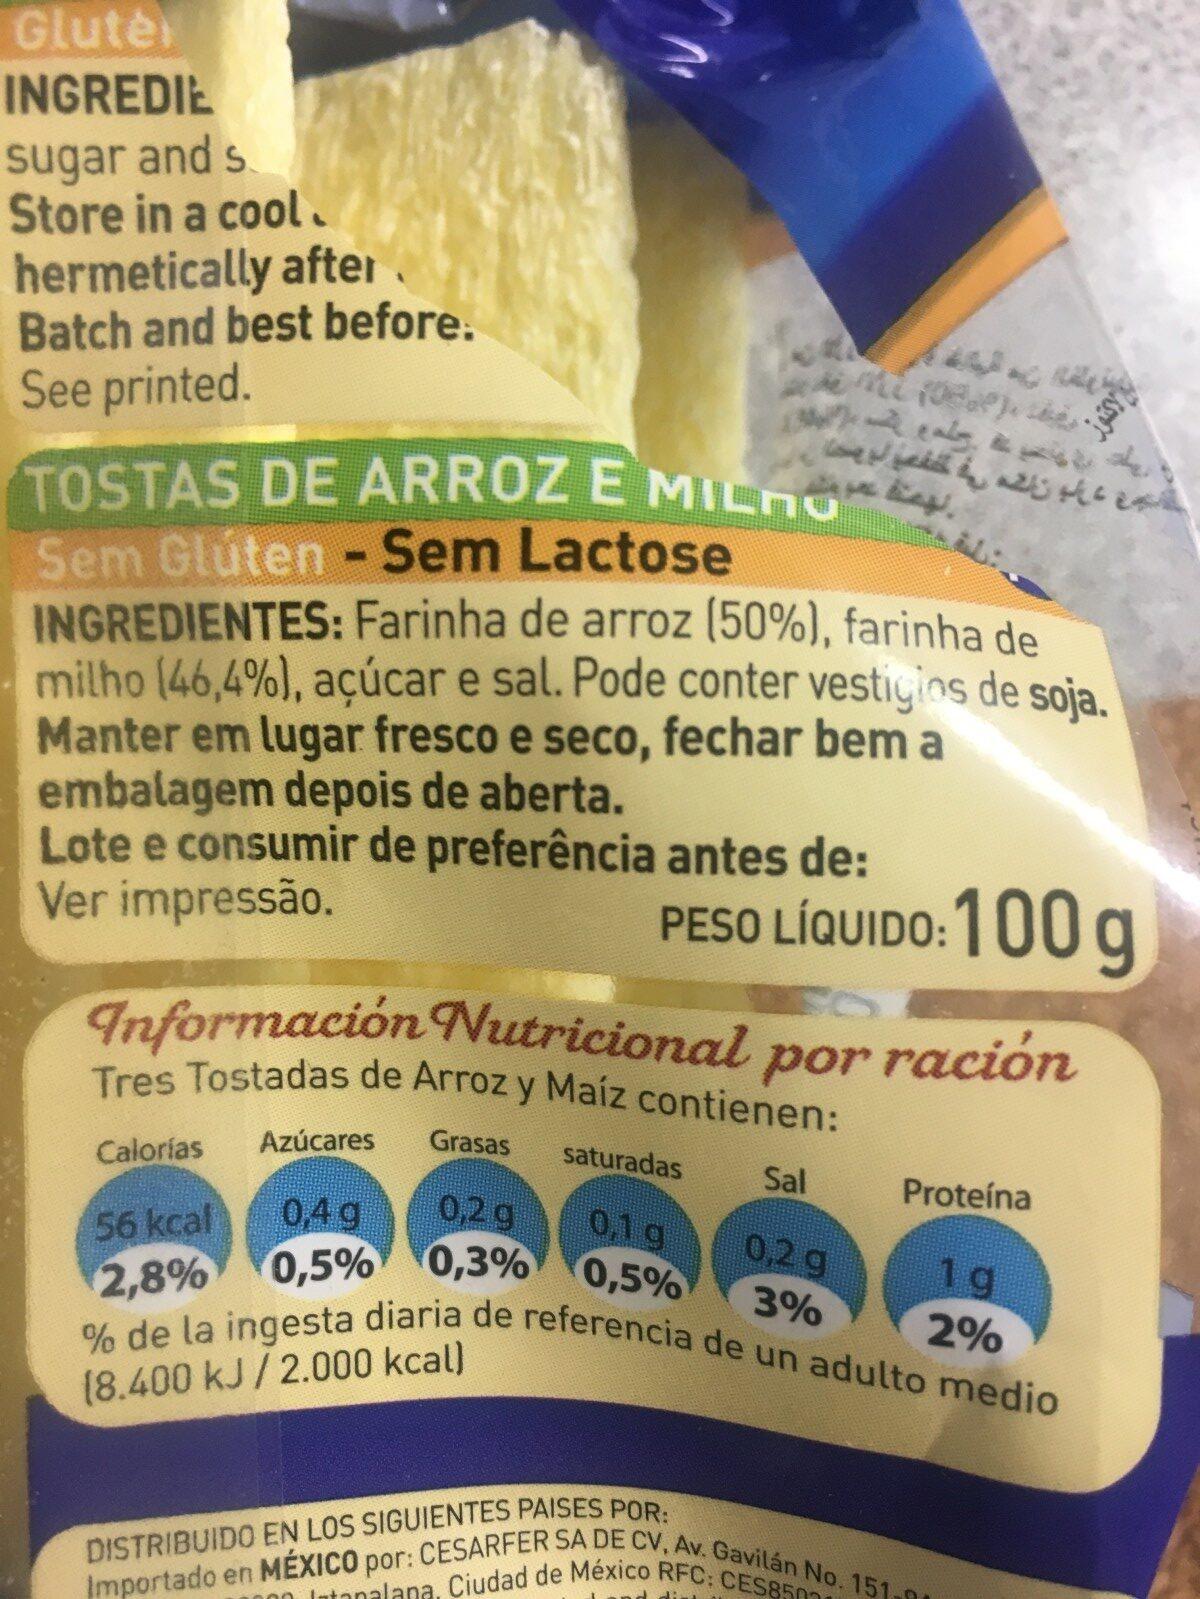 Tostadas de arroz y maíz - Ingrédients - fr